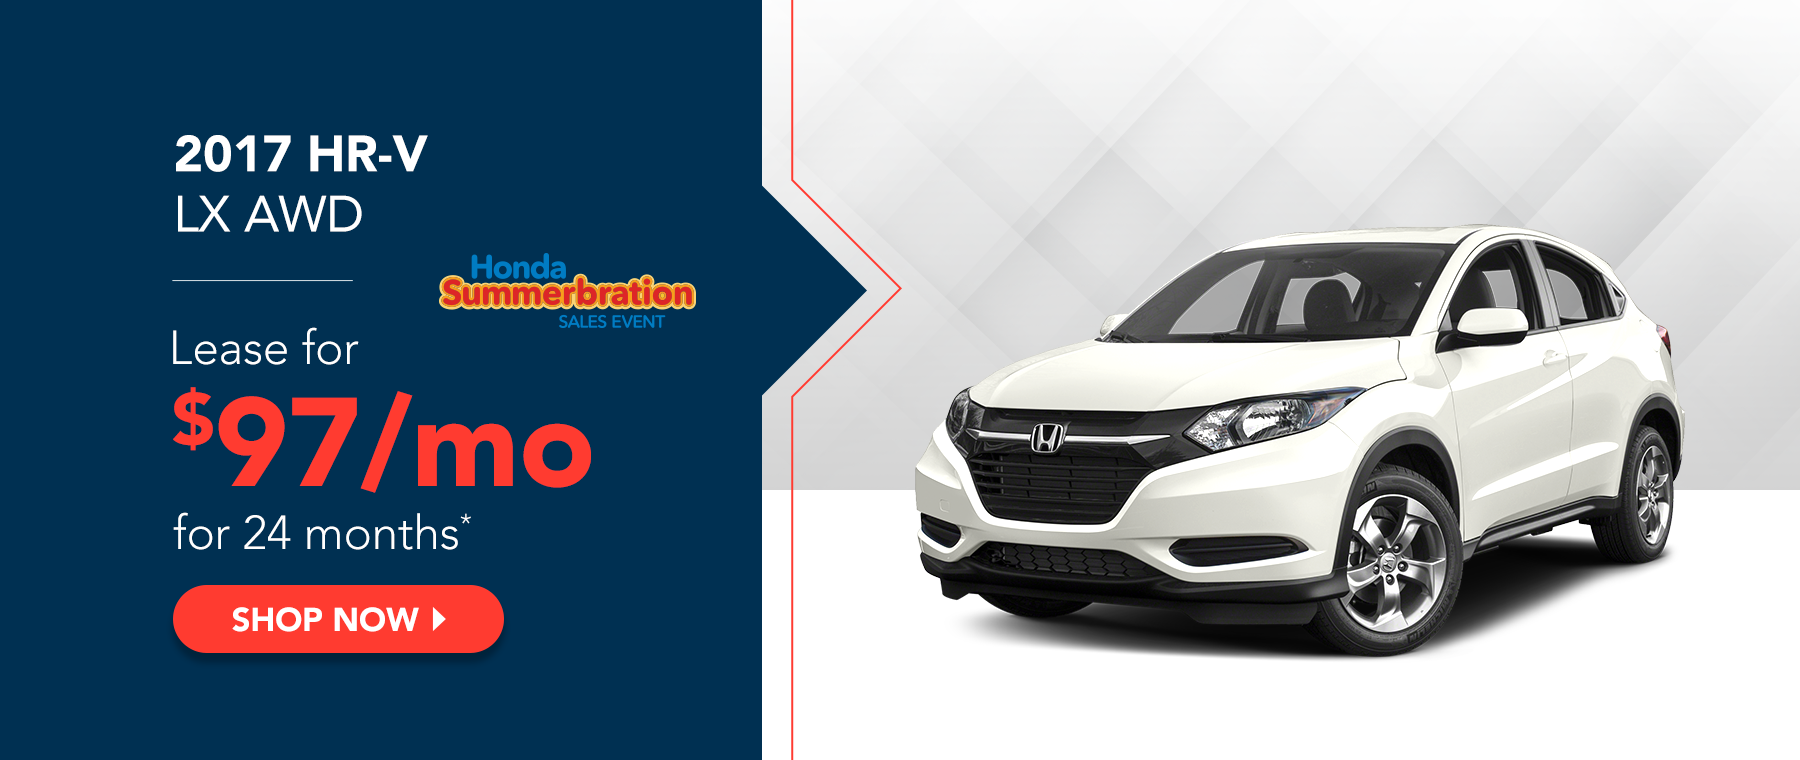 2017 HR-V LX AWD - Honda Summerbration Sales Event